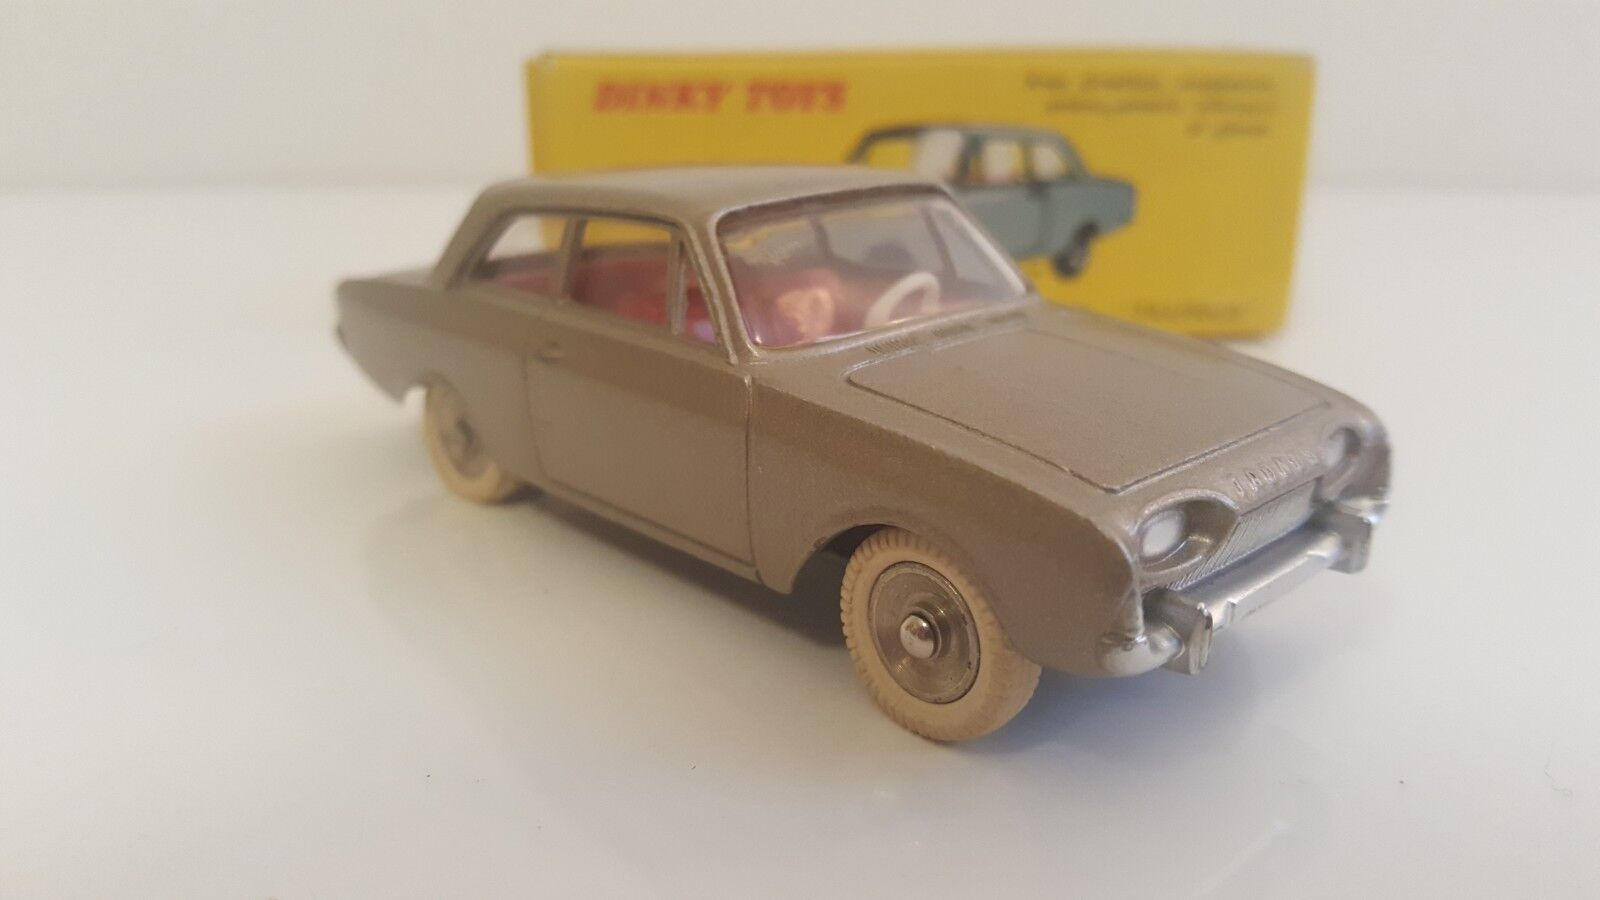 Dinky giocattoli - 559 - Ford Taunus en B.O. (pneus (pneus (pneus nervurés, châssis anodisé) VN Mib 82fb5d